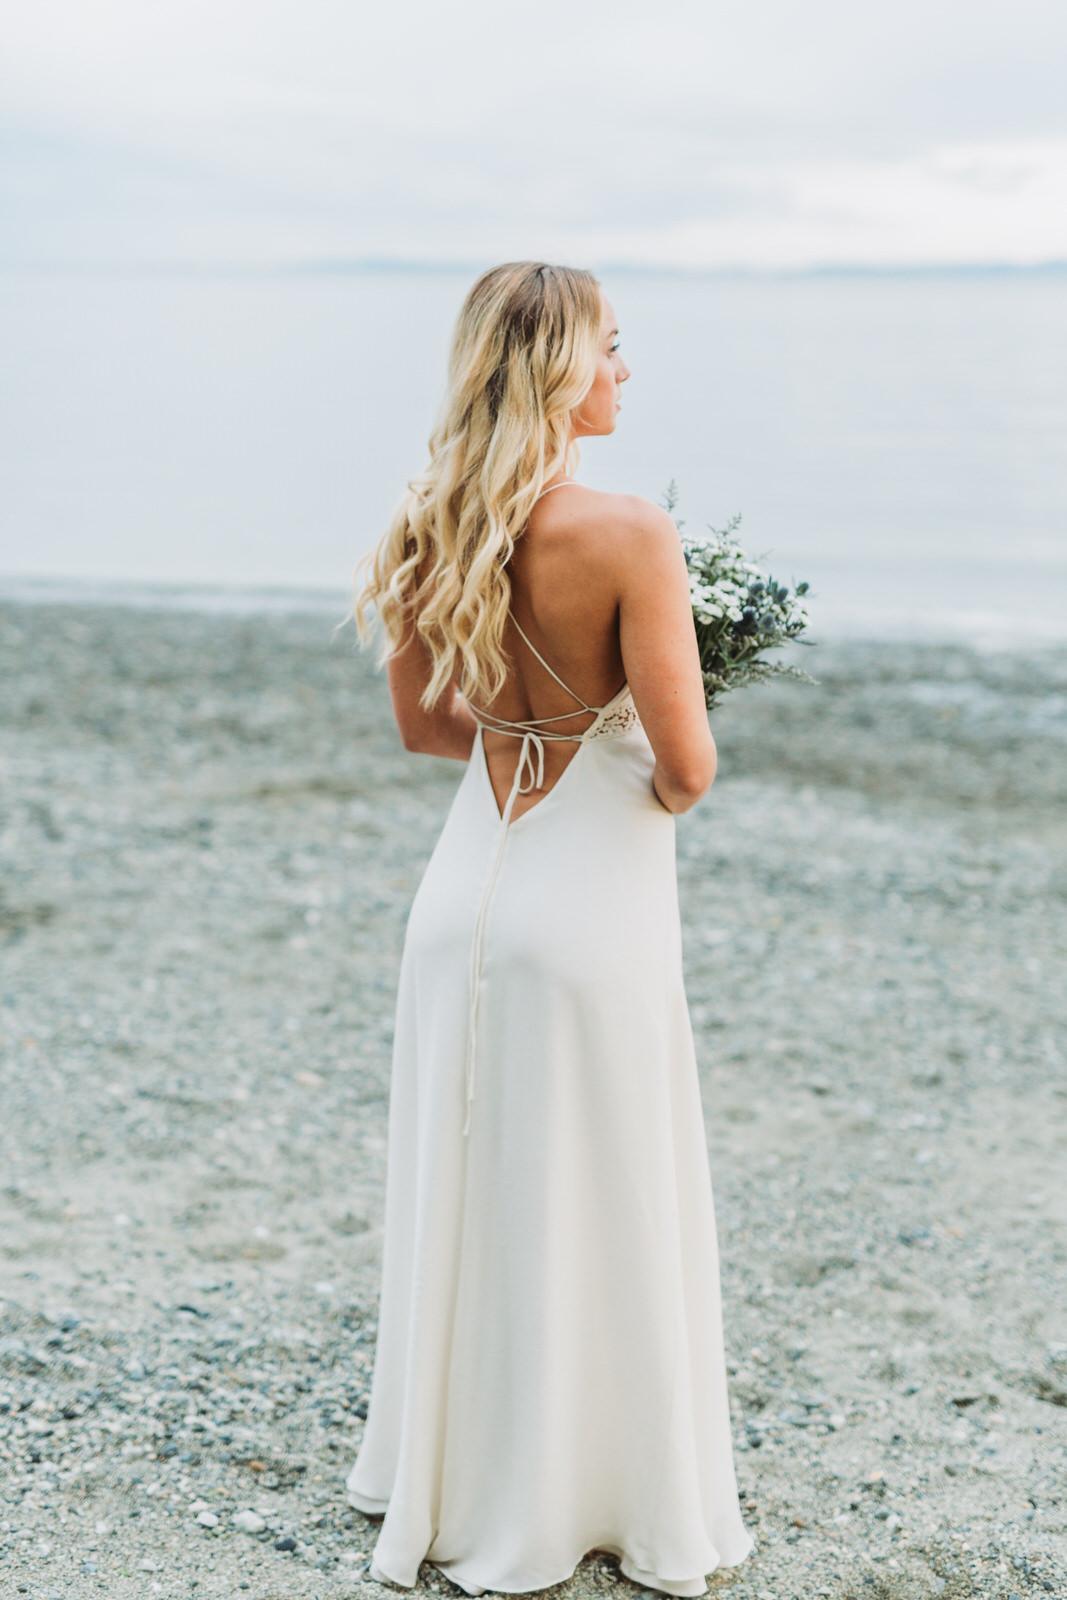 Jennifer Picard Photography - Vancouver Wedding Photographer - Sunshine Coast Wedding Photographer - Bridal InspirationIMG_9165.jpg